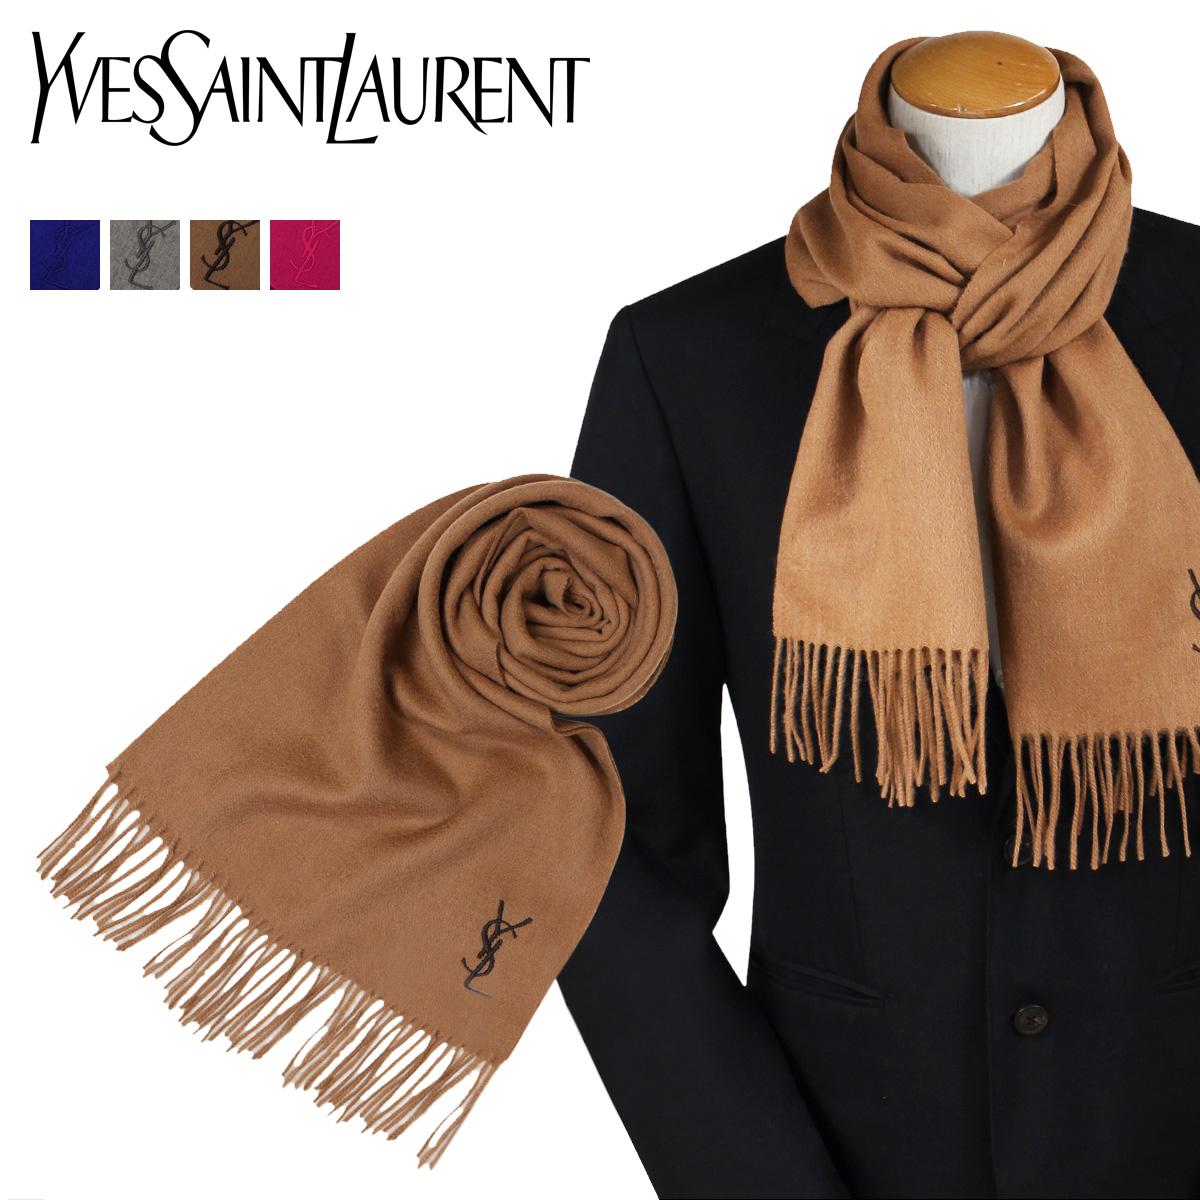 d7cc0166841 Yves Saint Laurent scarf men gap Dis Yves Saint-Laurent YSL scarf stall  wool logo LOGO WOOL SCARF